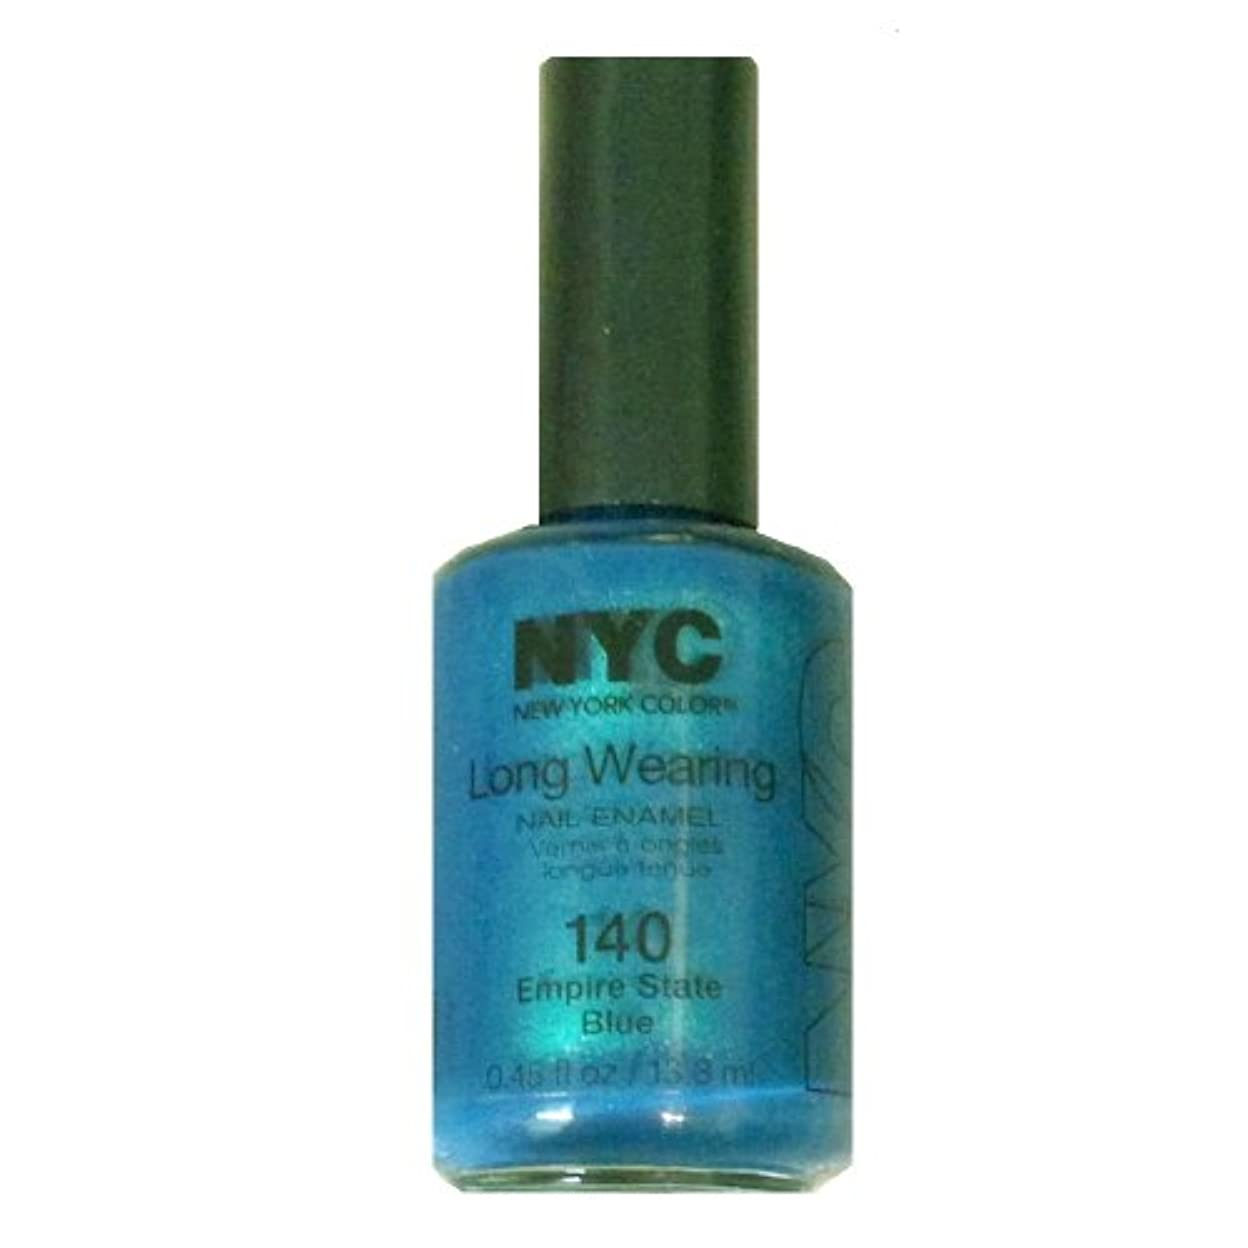 NYC Long Wearing Nail Enamel - Empire State Blue (並行輸入品)